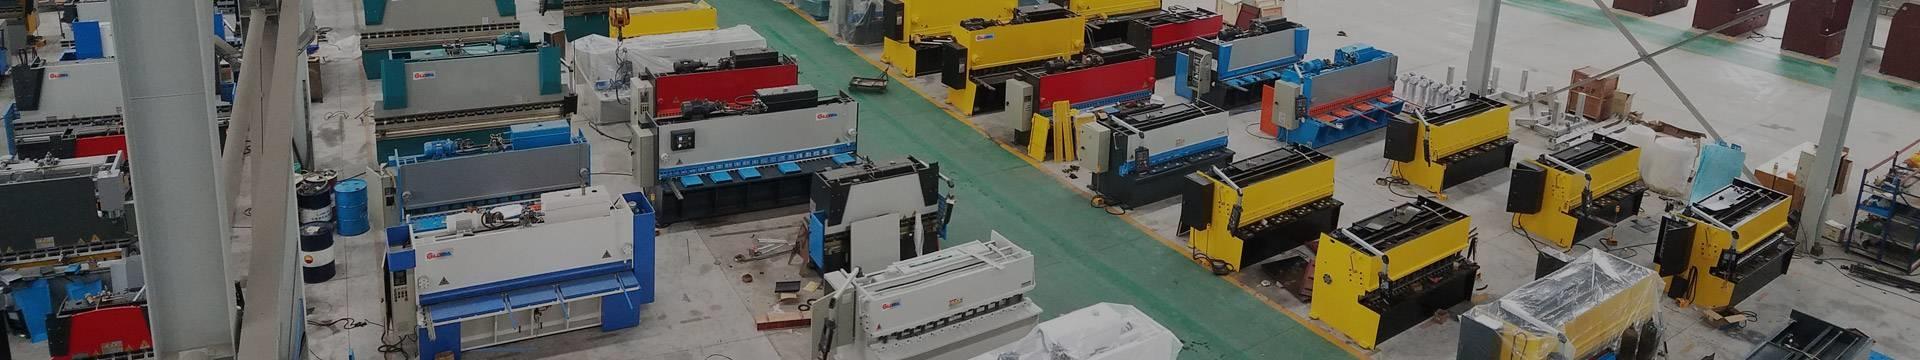 Ma'anshan Gilde CNC Machine Tool Co.,Ltd  (@gldma) Cover Image